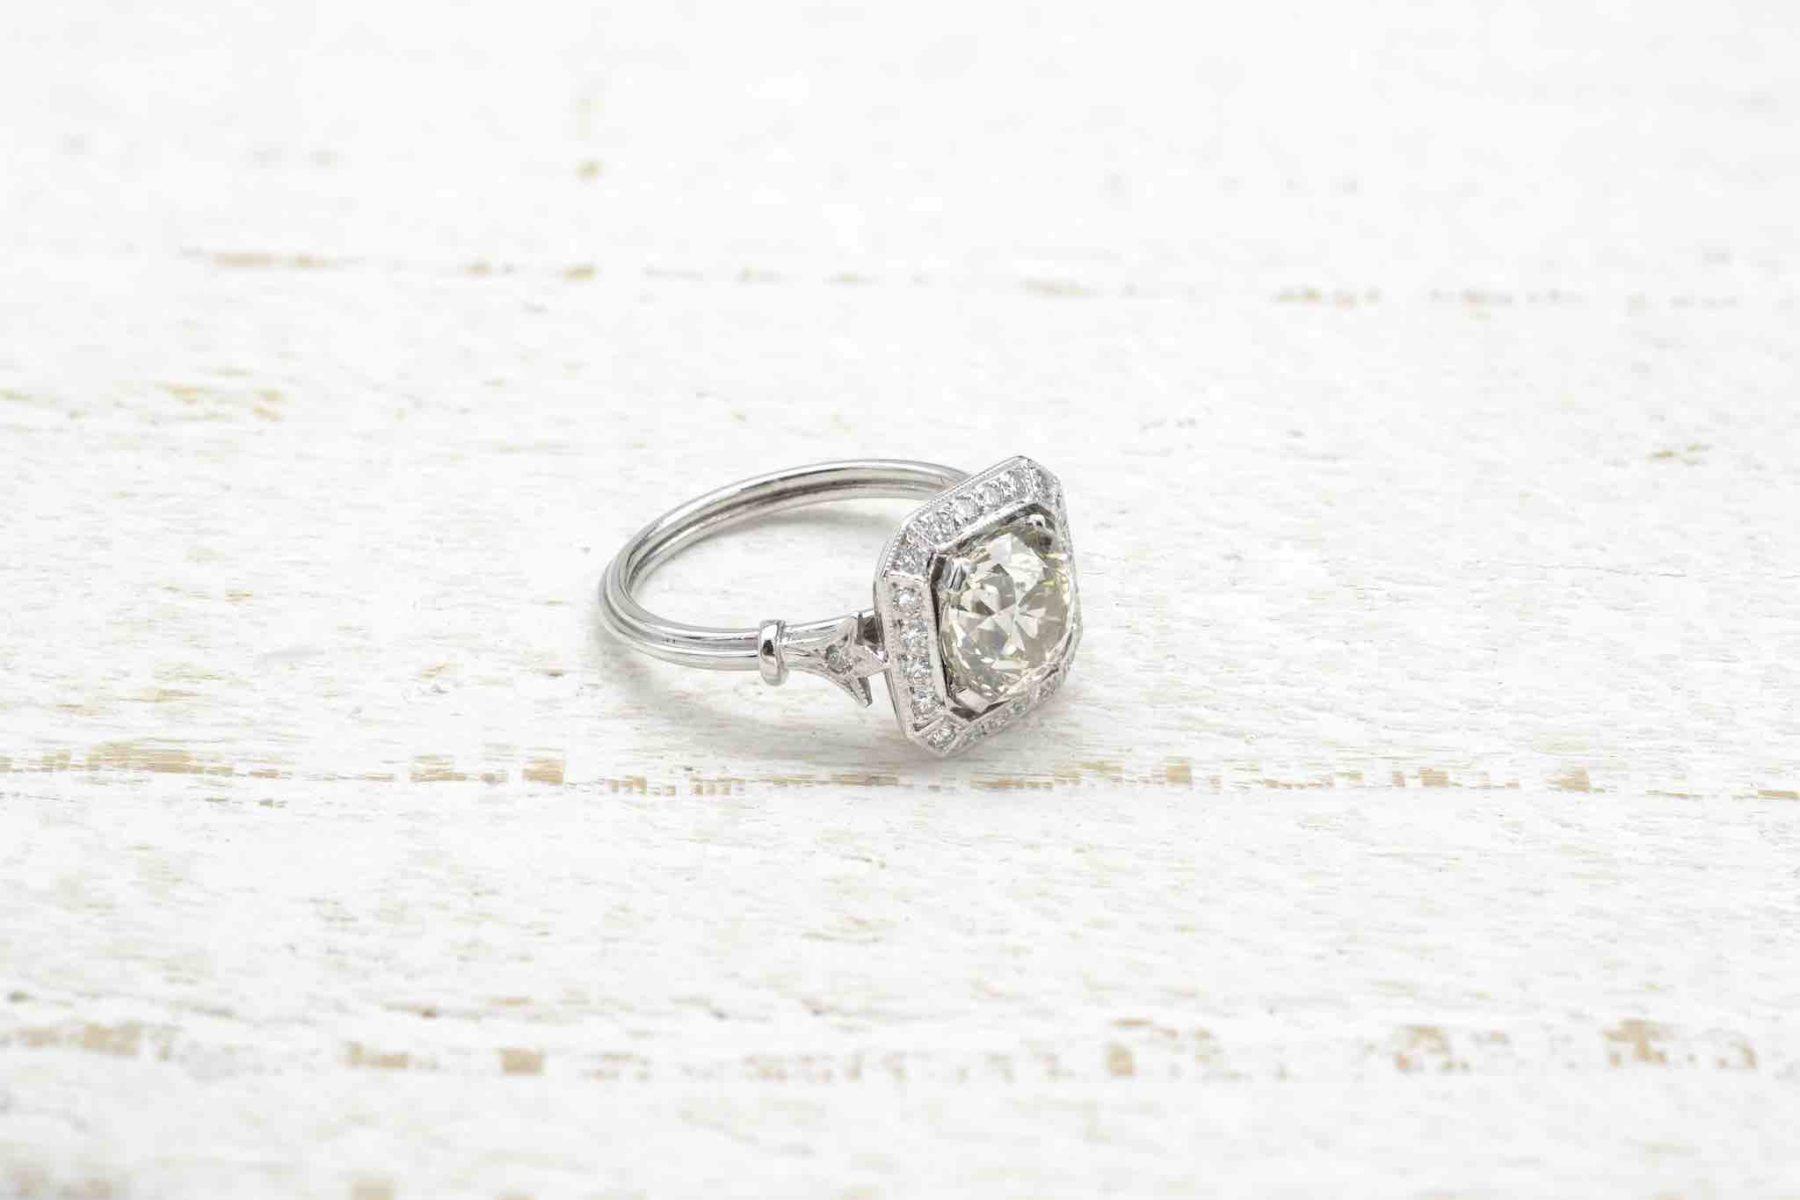 Bague diamant en platine